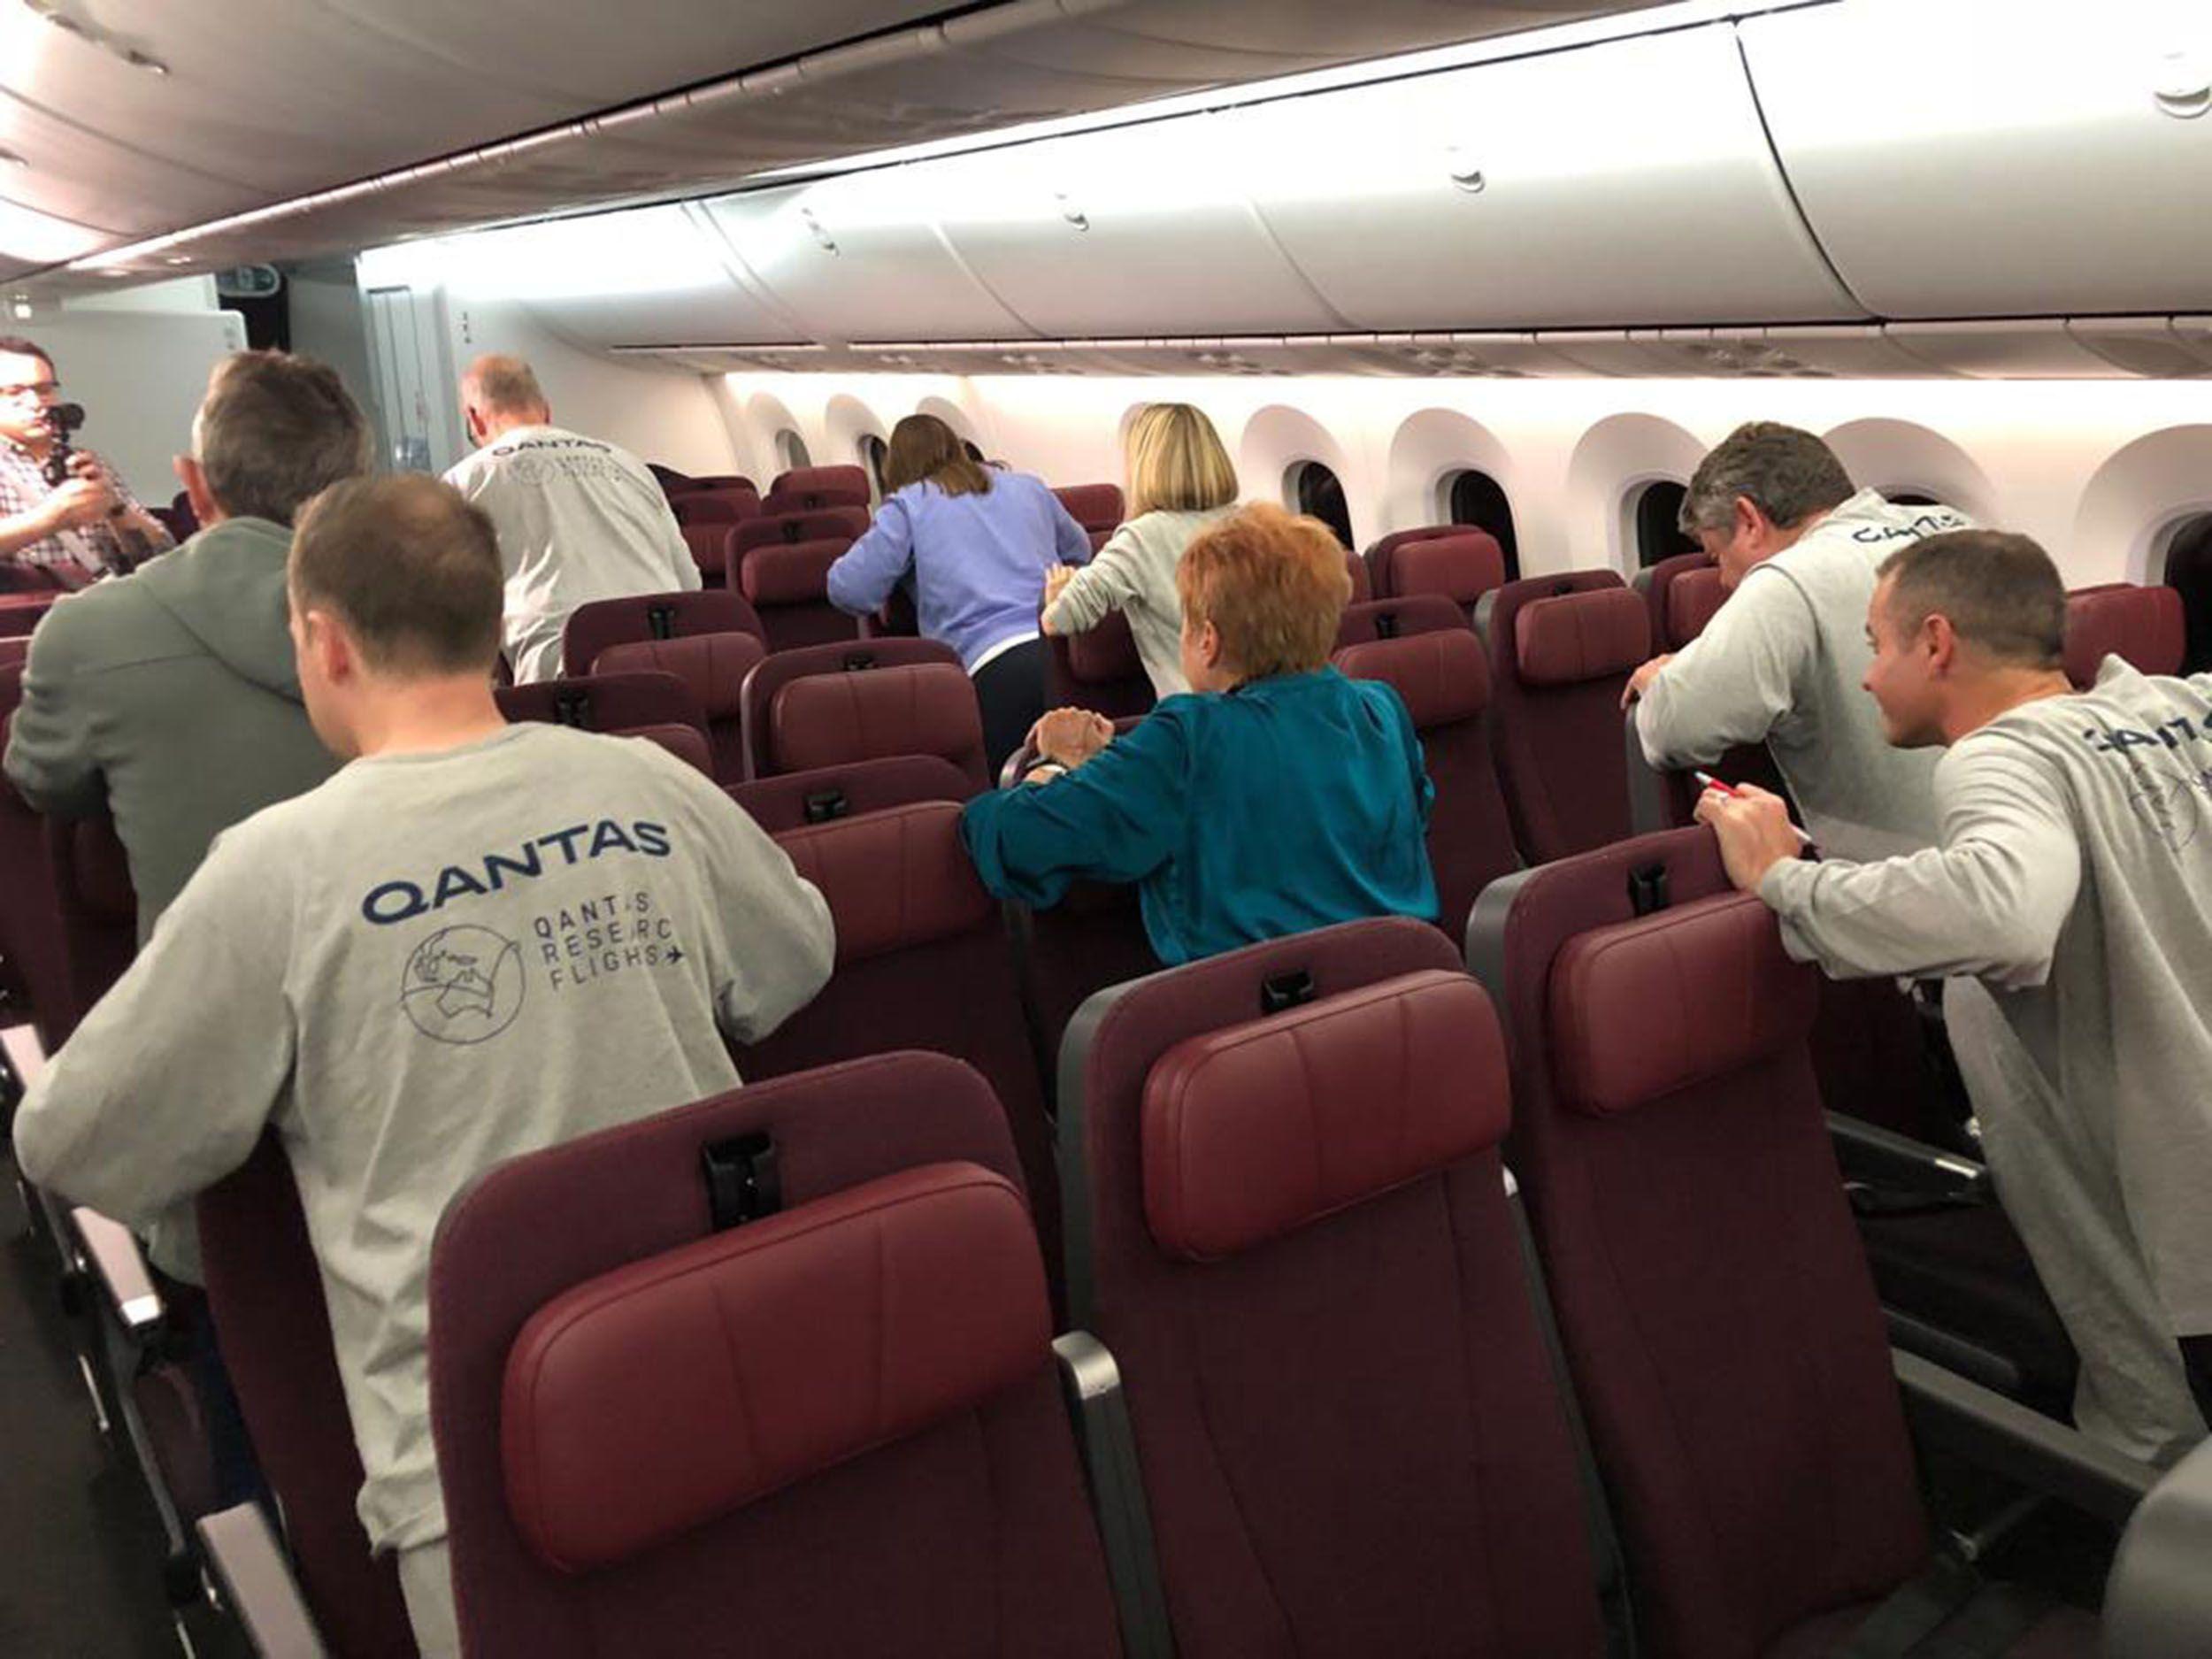 Passageiros fazem exercícios durante voo. Foto: Angus Whitley/Bloomberg